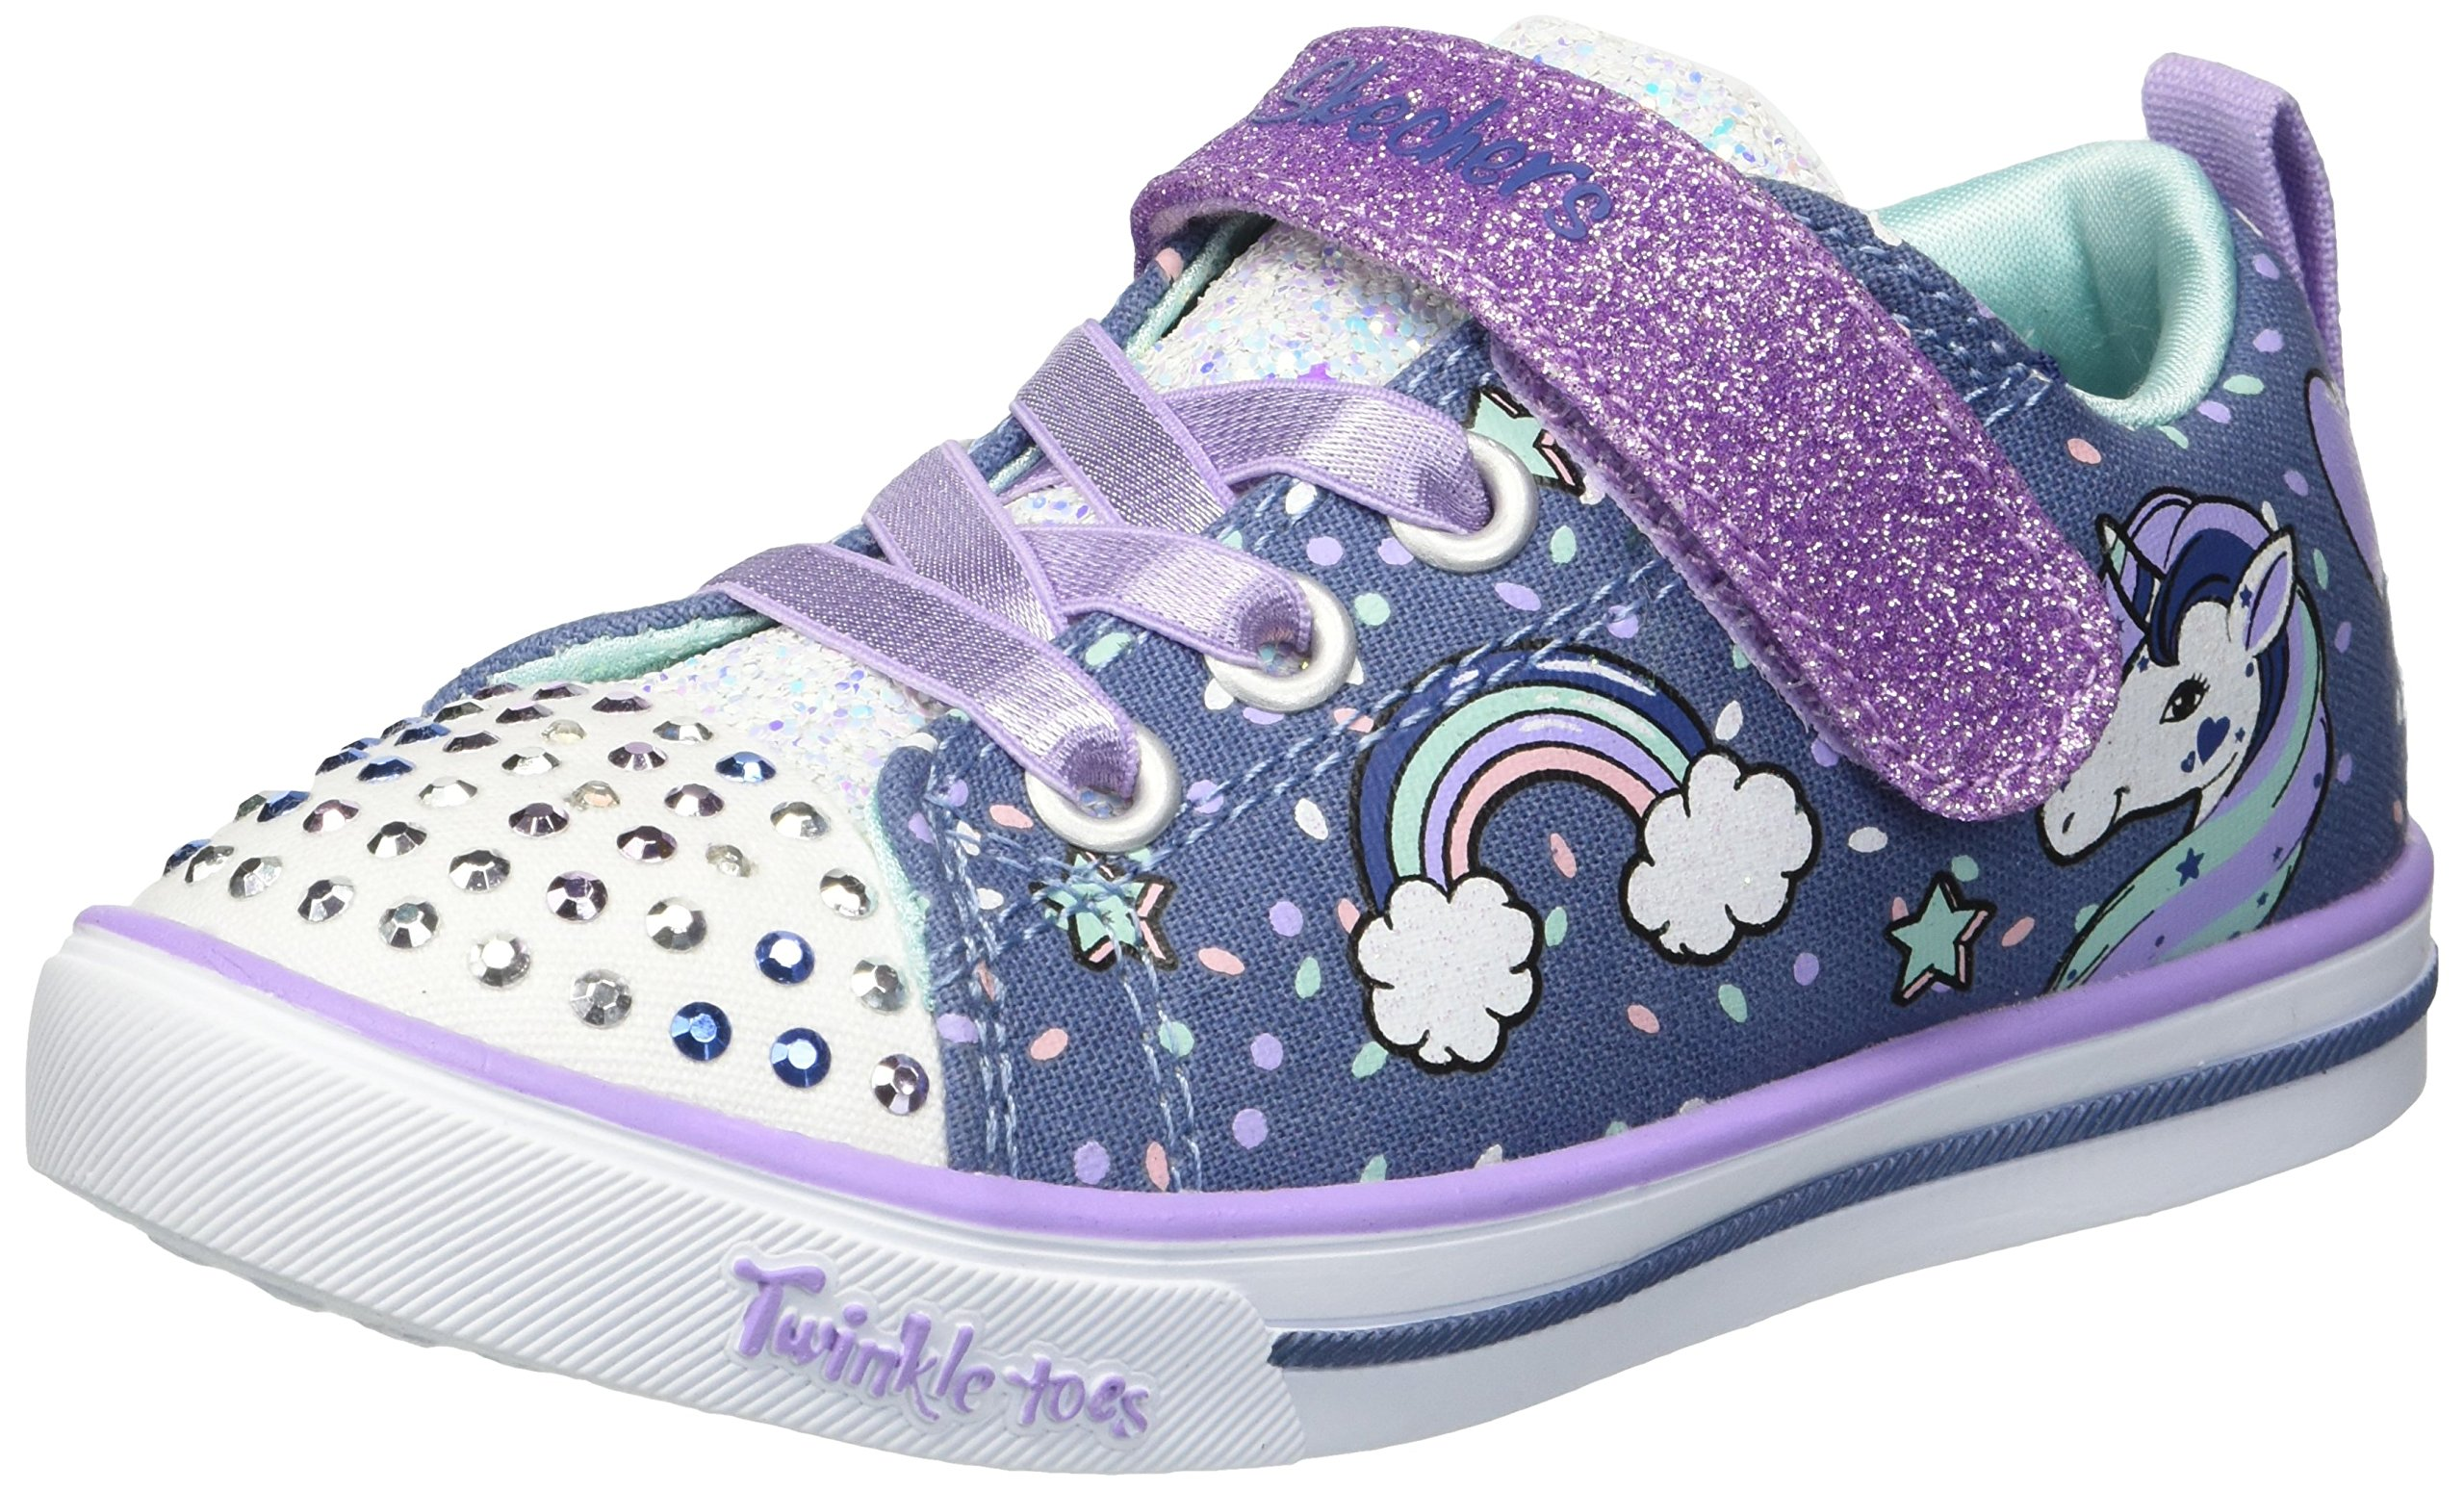 Skechers Kids Girls' Sparkle LITE-Unicorn Craze Sneaker, Denim/Lavender, 10 Medium US Toddler